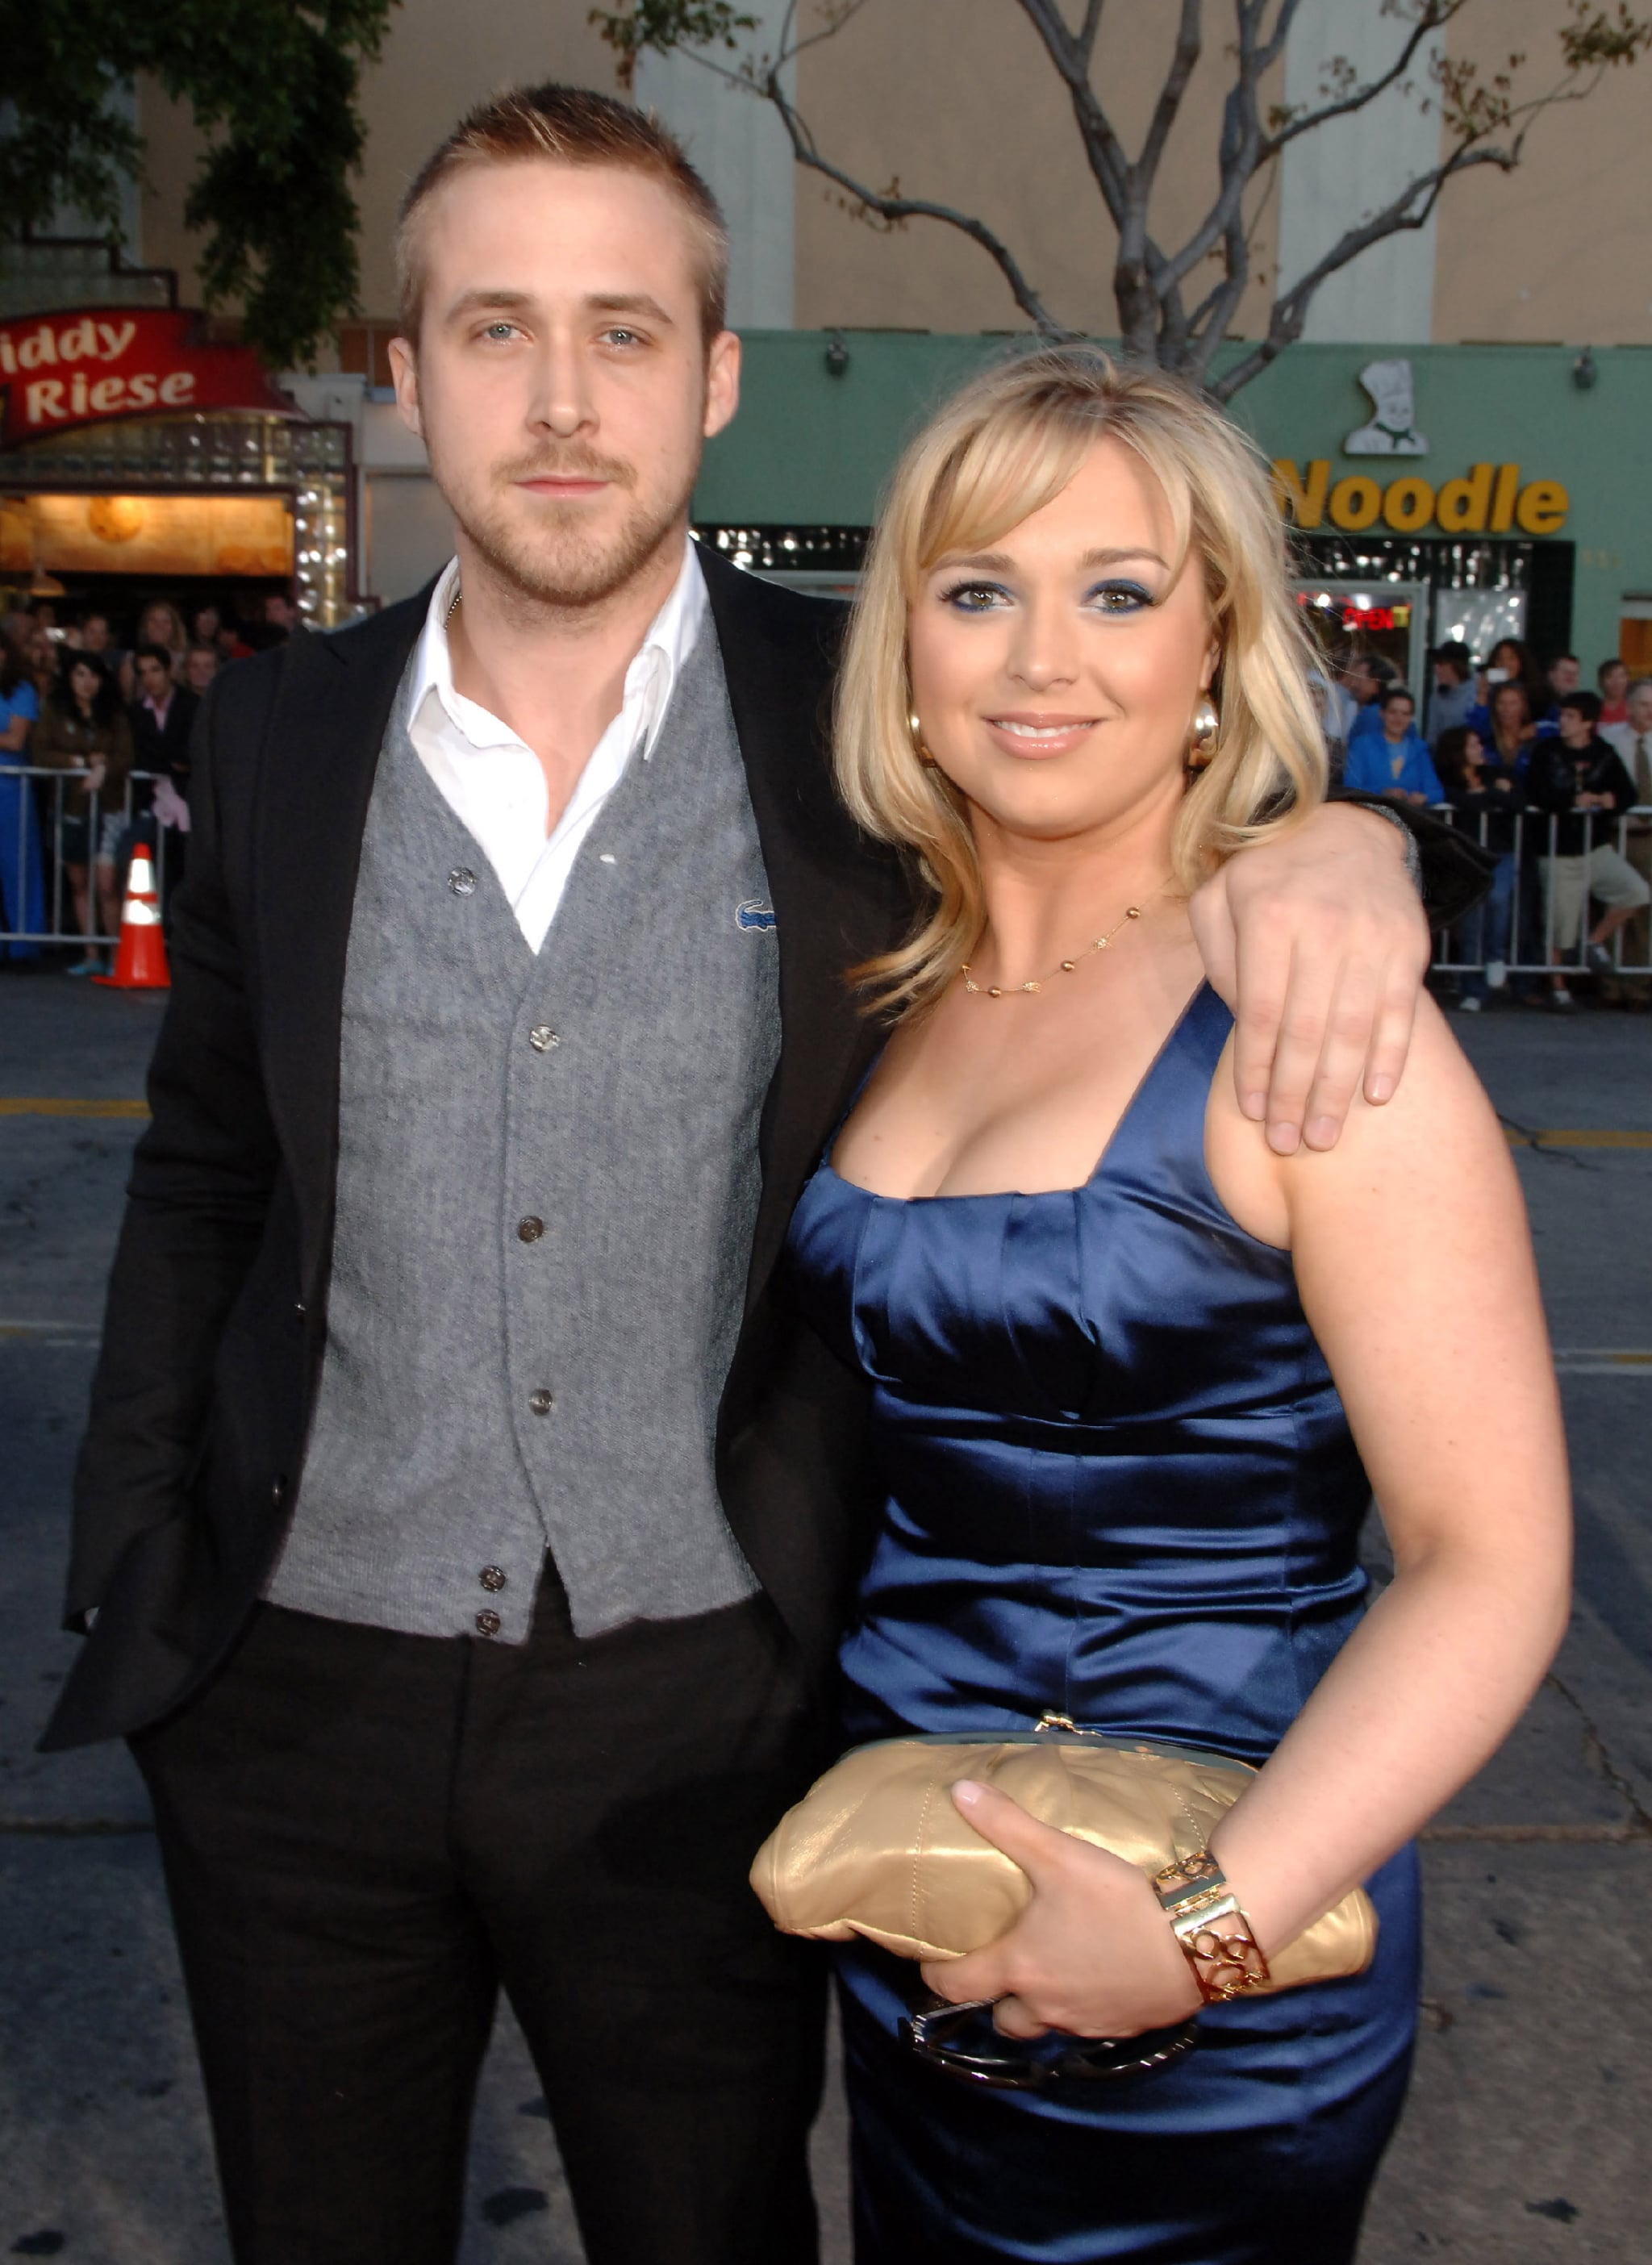 Ryan Mandi Gosling besides Vestidos Curtos Das Famosas additionally Penelope Cruz Her Oscars Makeup likewise 9391056 furthermore Stefon From Saturday Night Live. on oscar award personalize